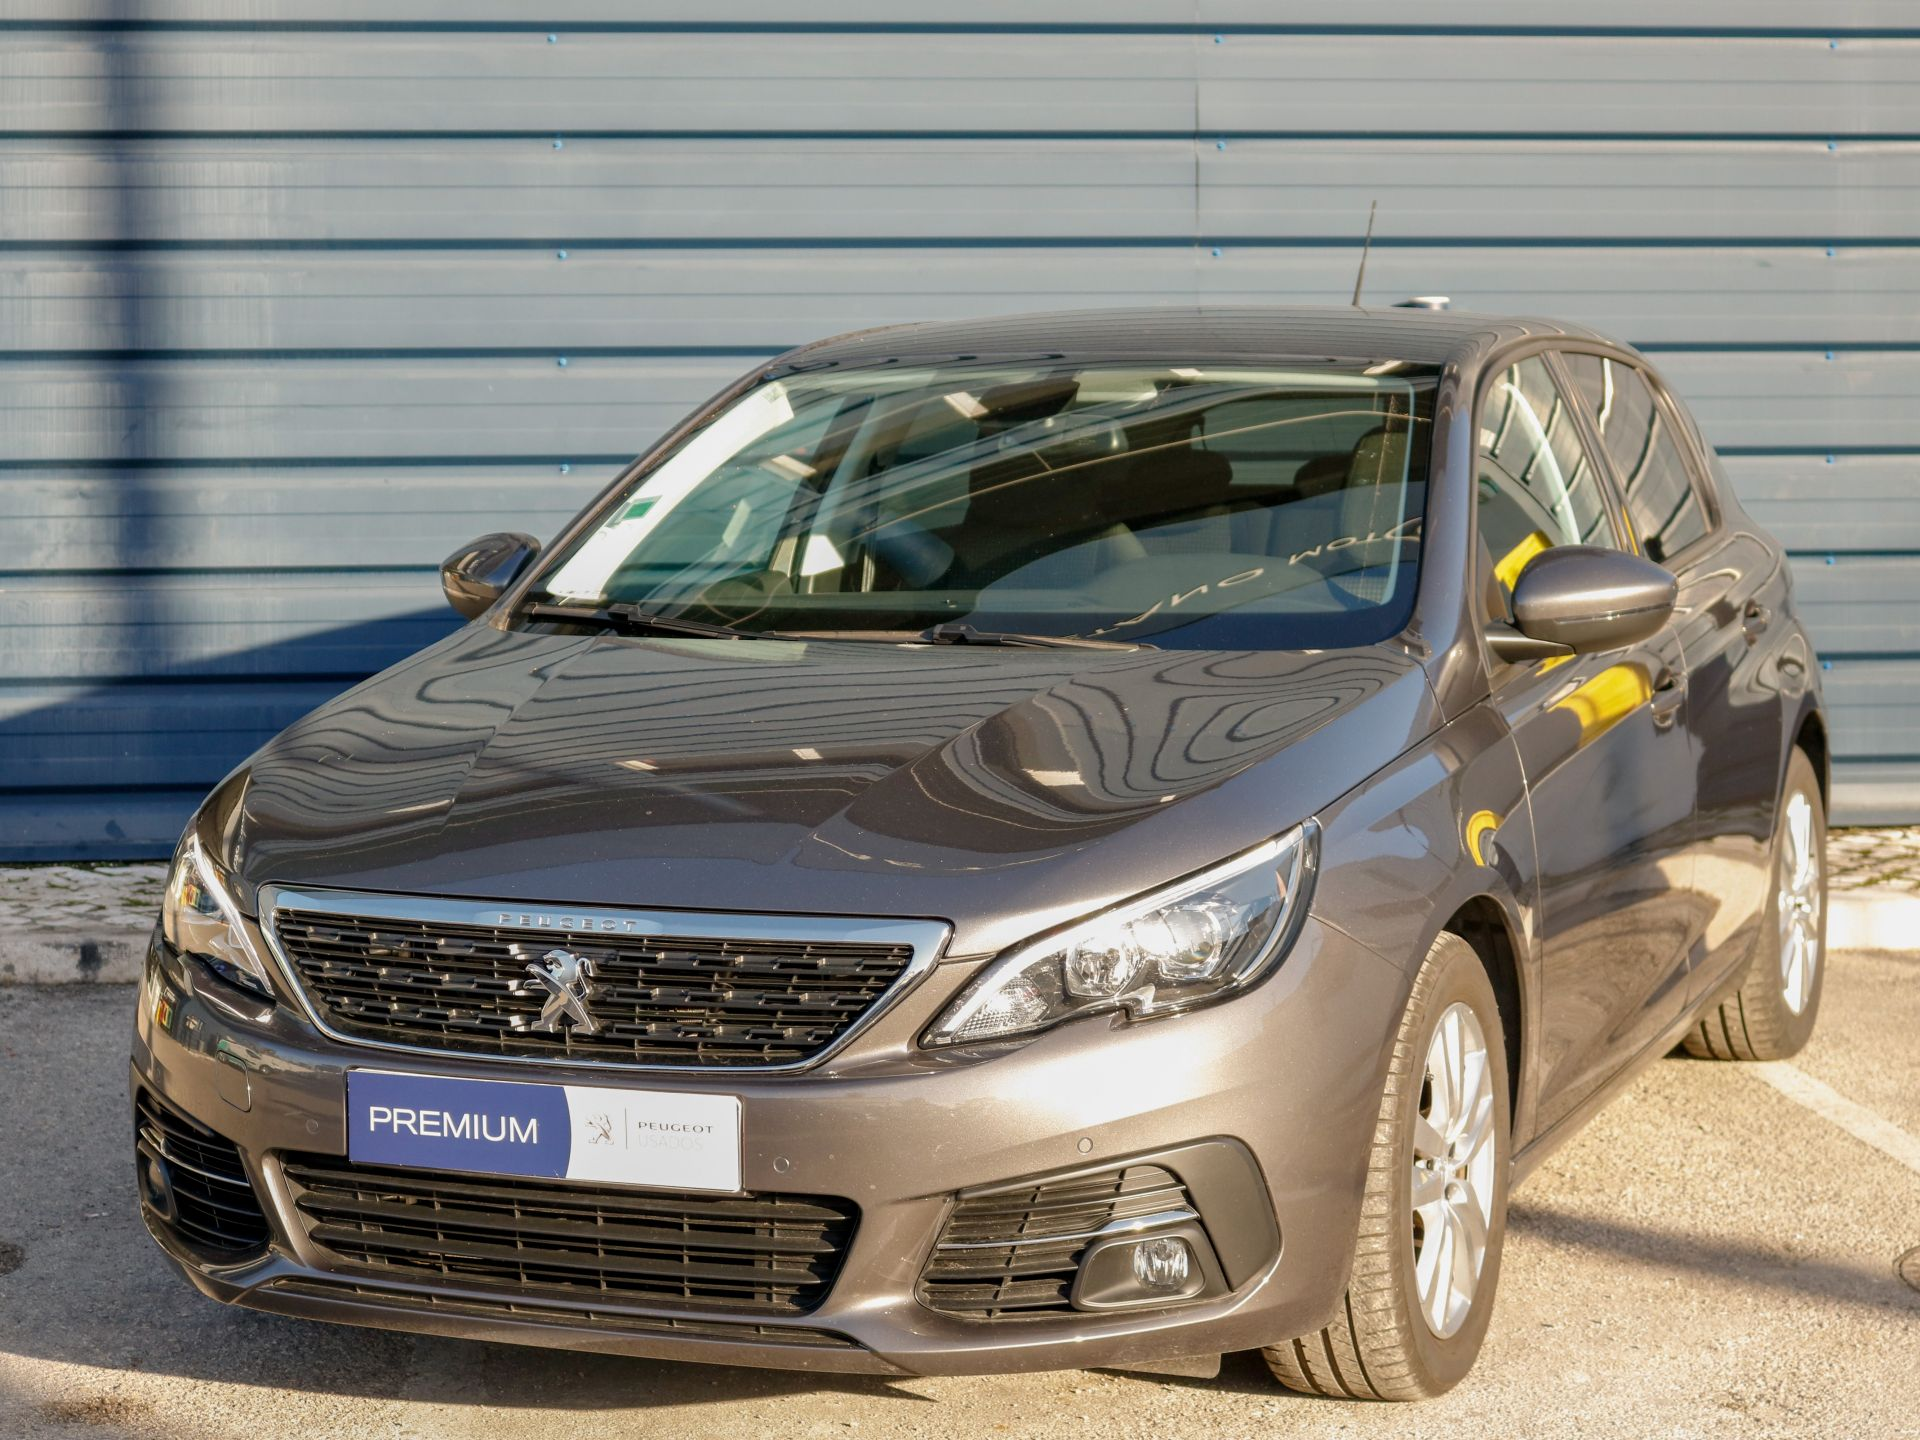 Peugeot 308 Style 1.2 PureTech 130 cv Euro 6.3d segunda mão Setúbal